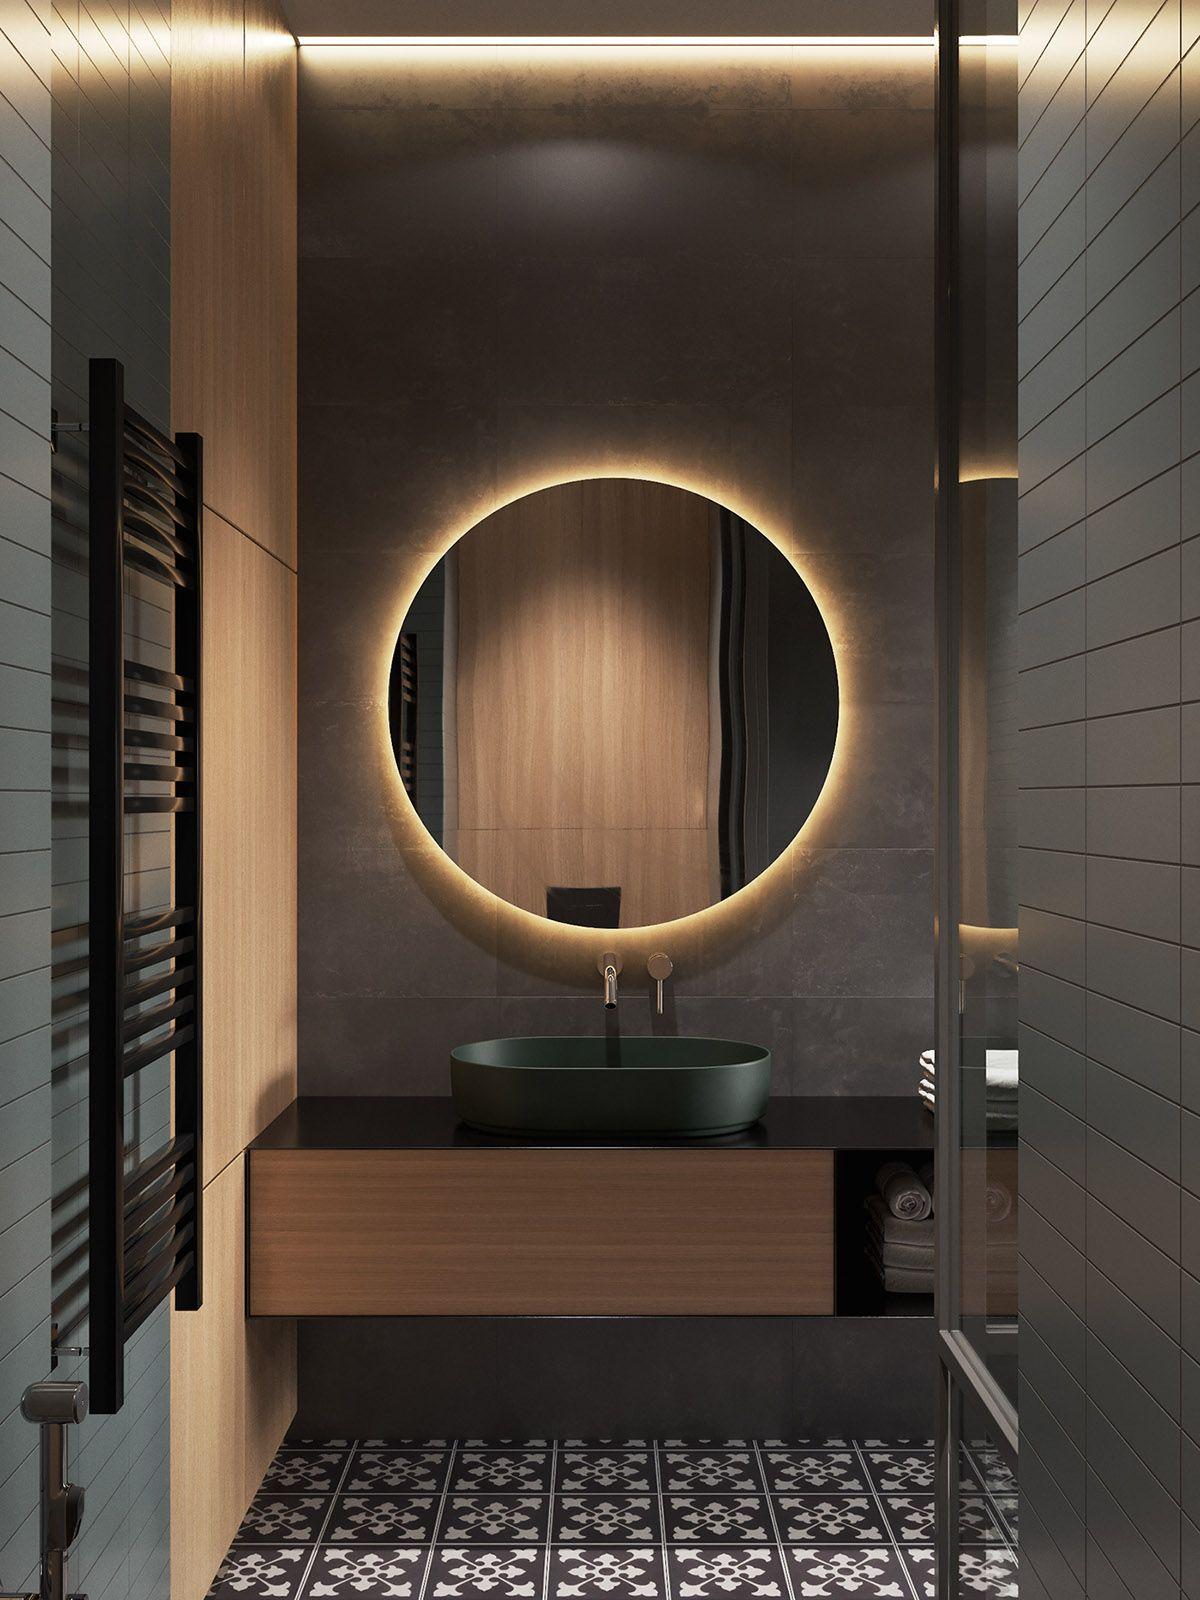 Interior Design Using Moody Colours And Natural Materials #lightingdesign